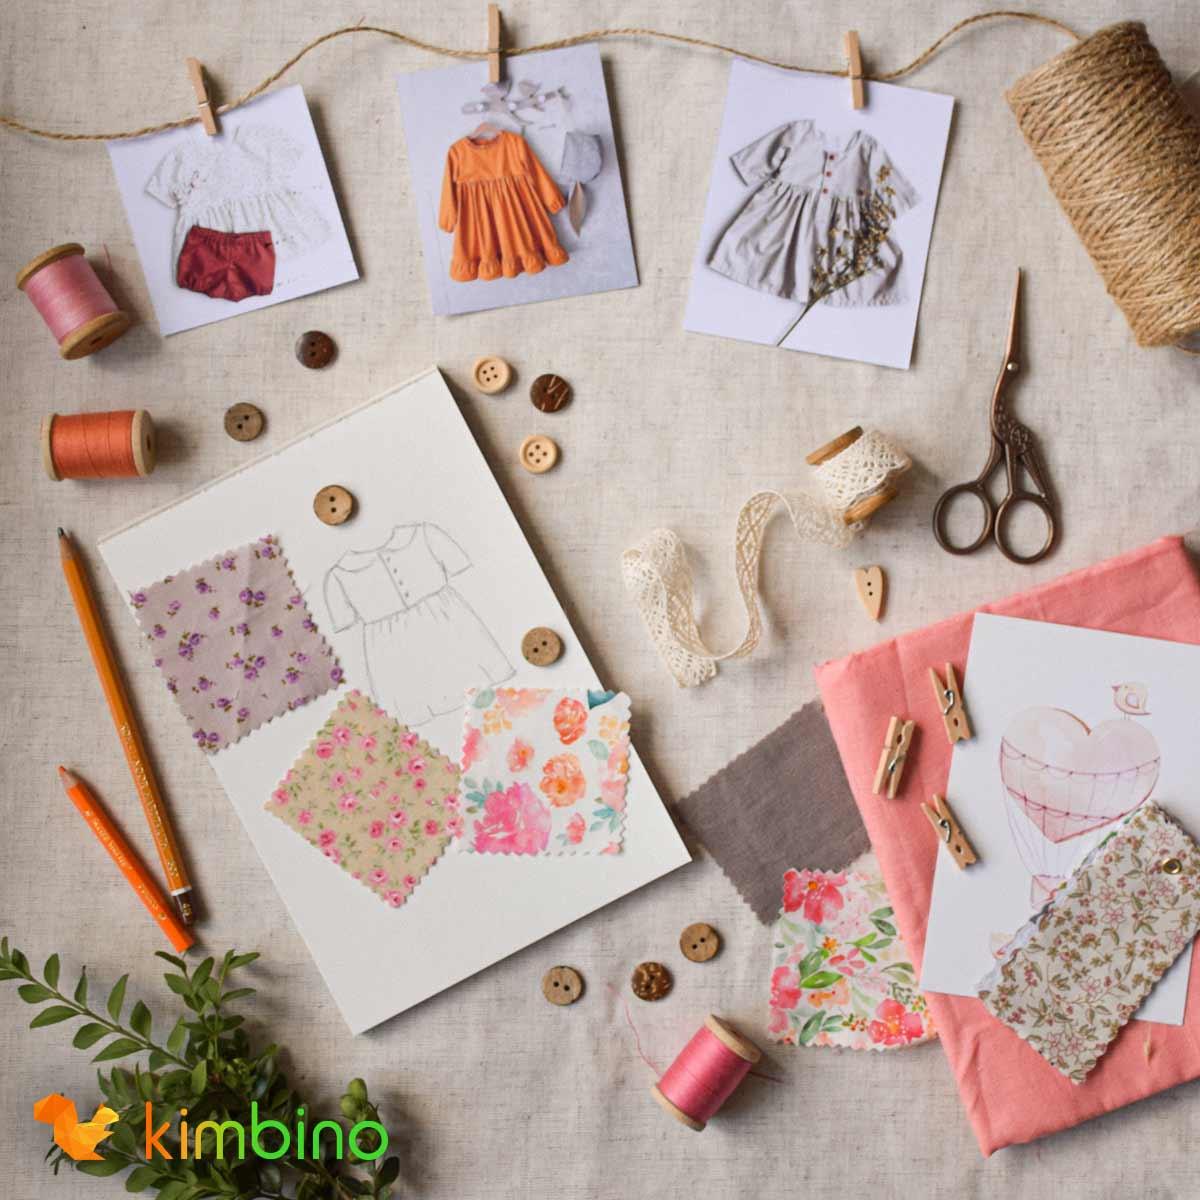 creative kimbino